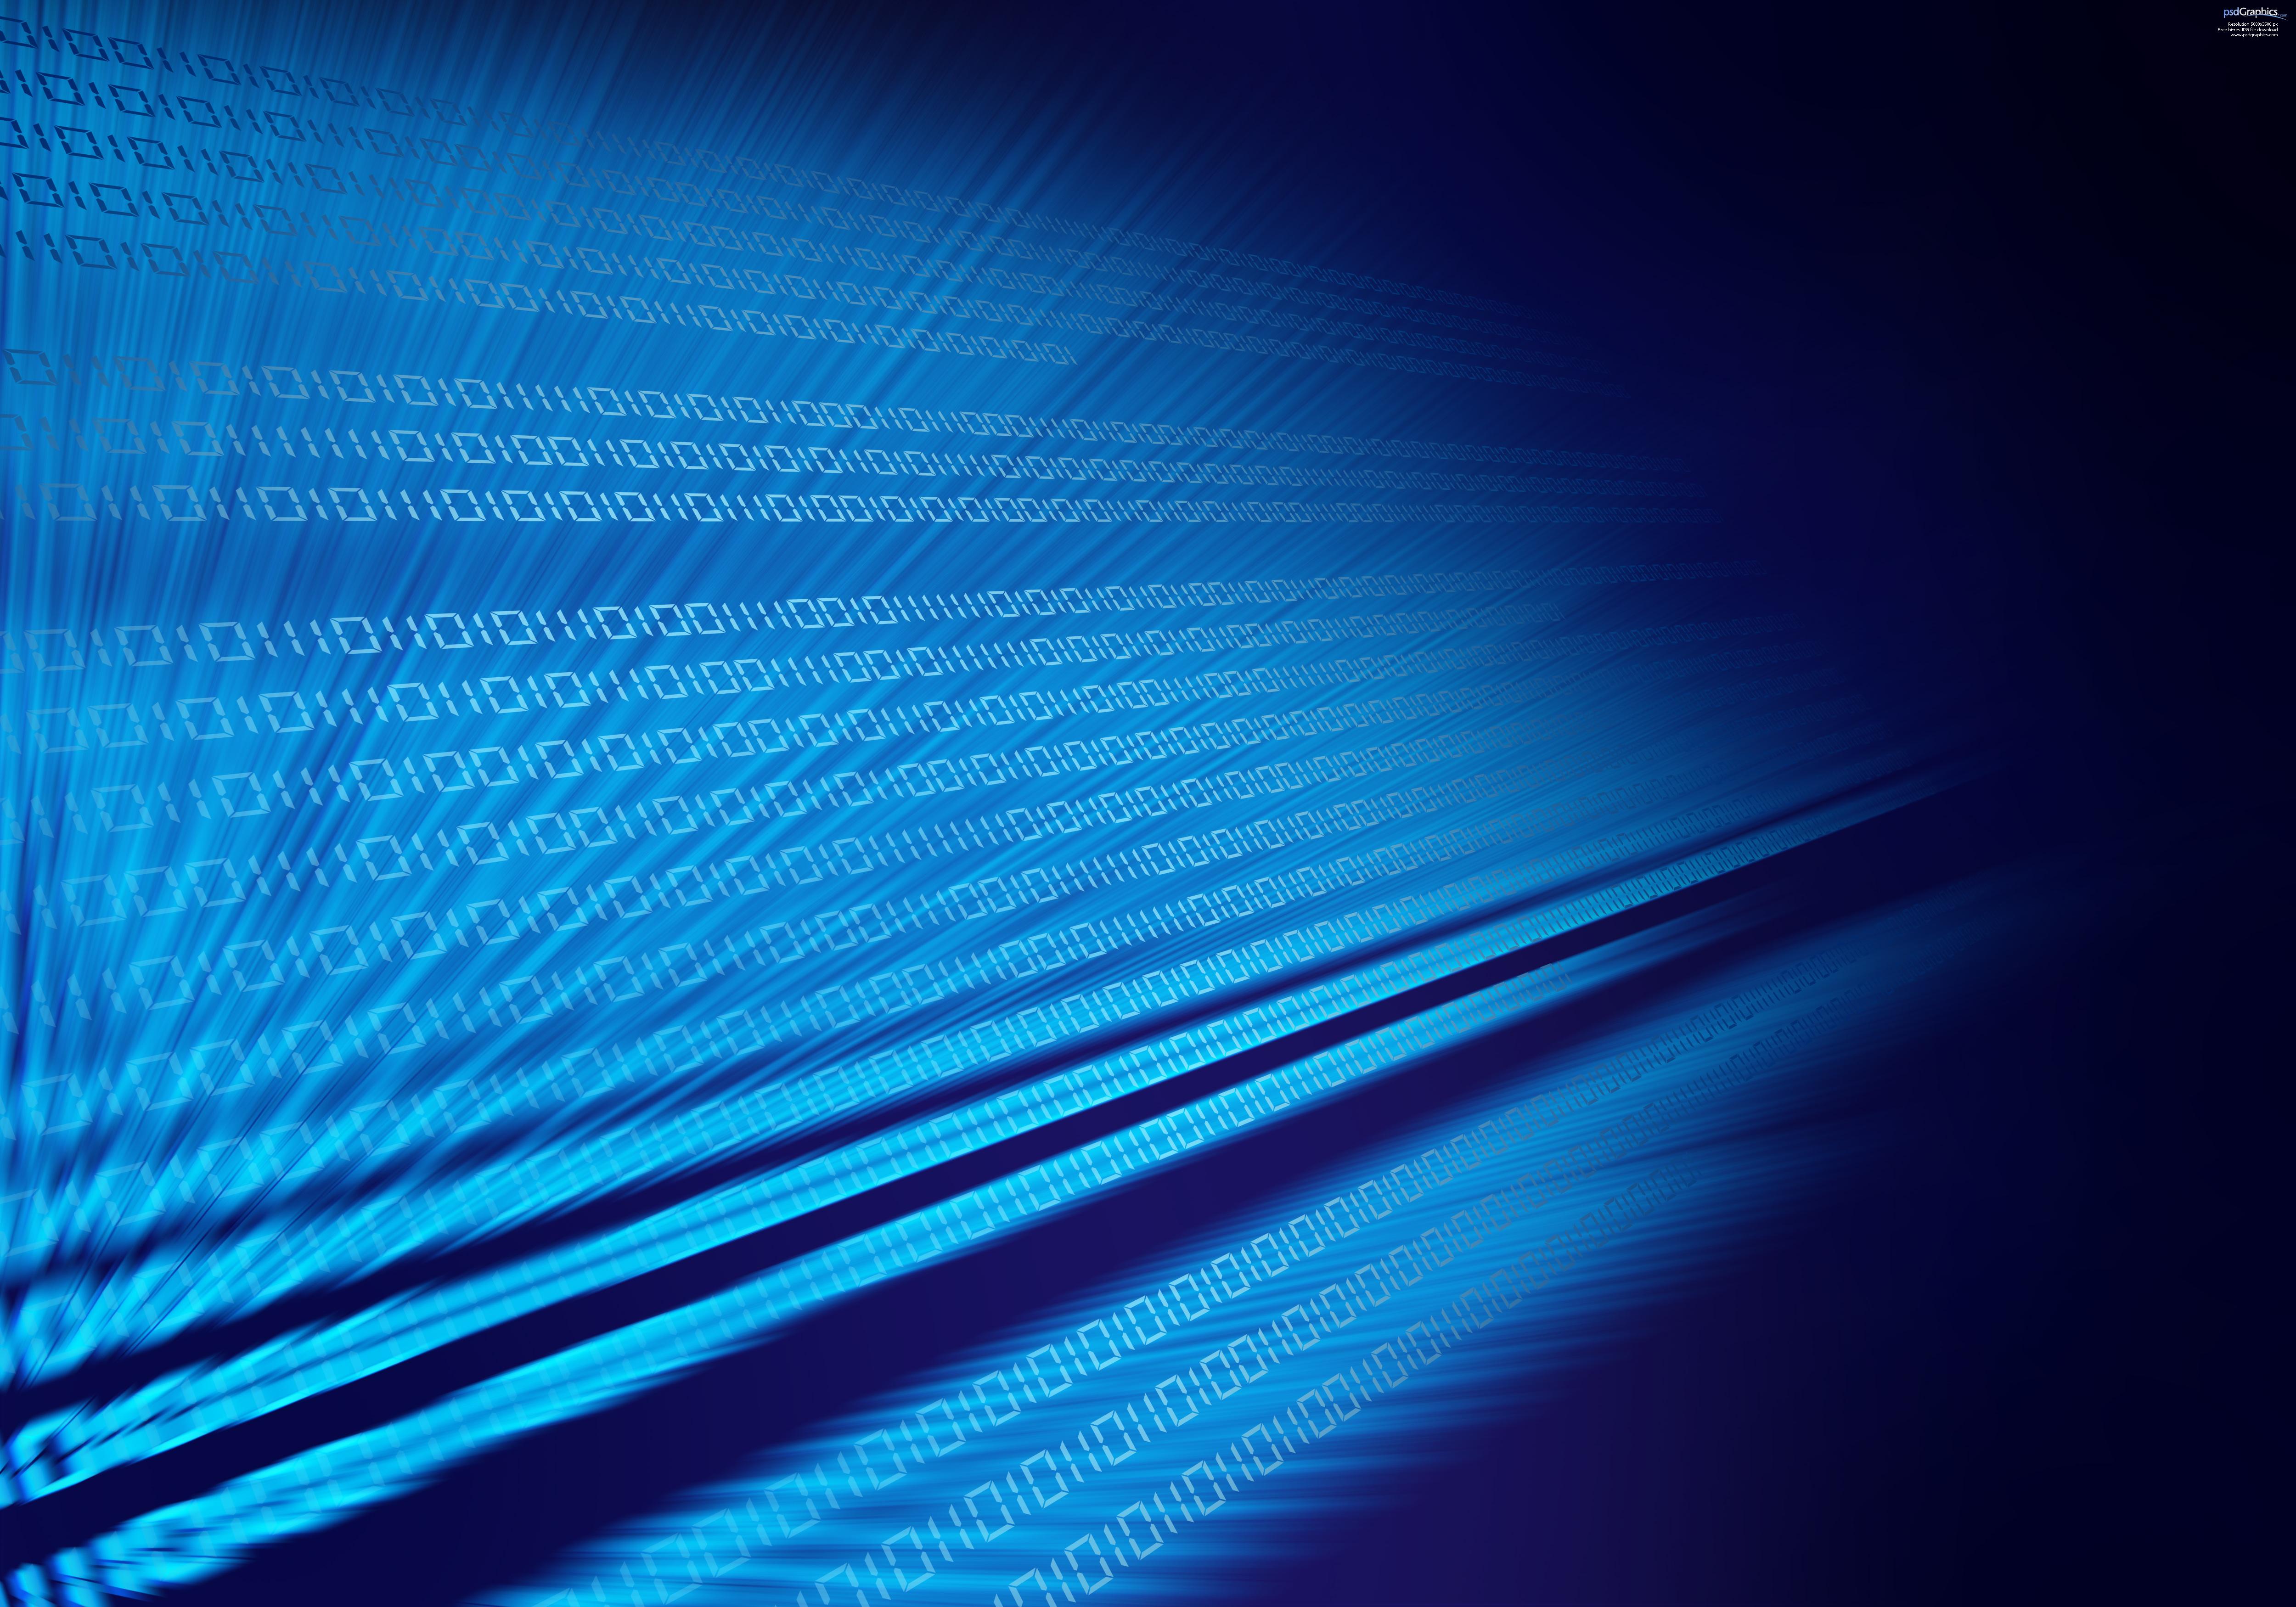 Blue binary code, digital background | PSDGraphics